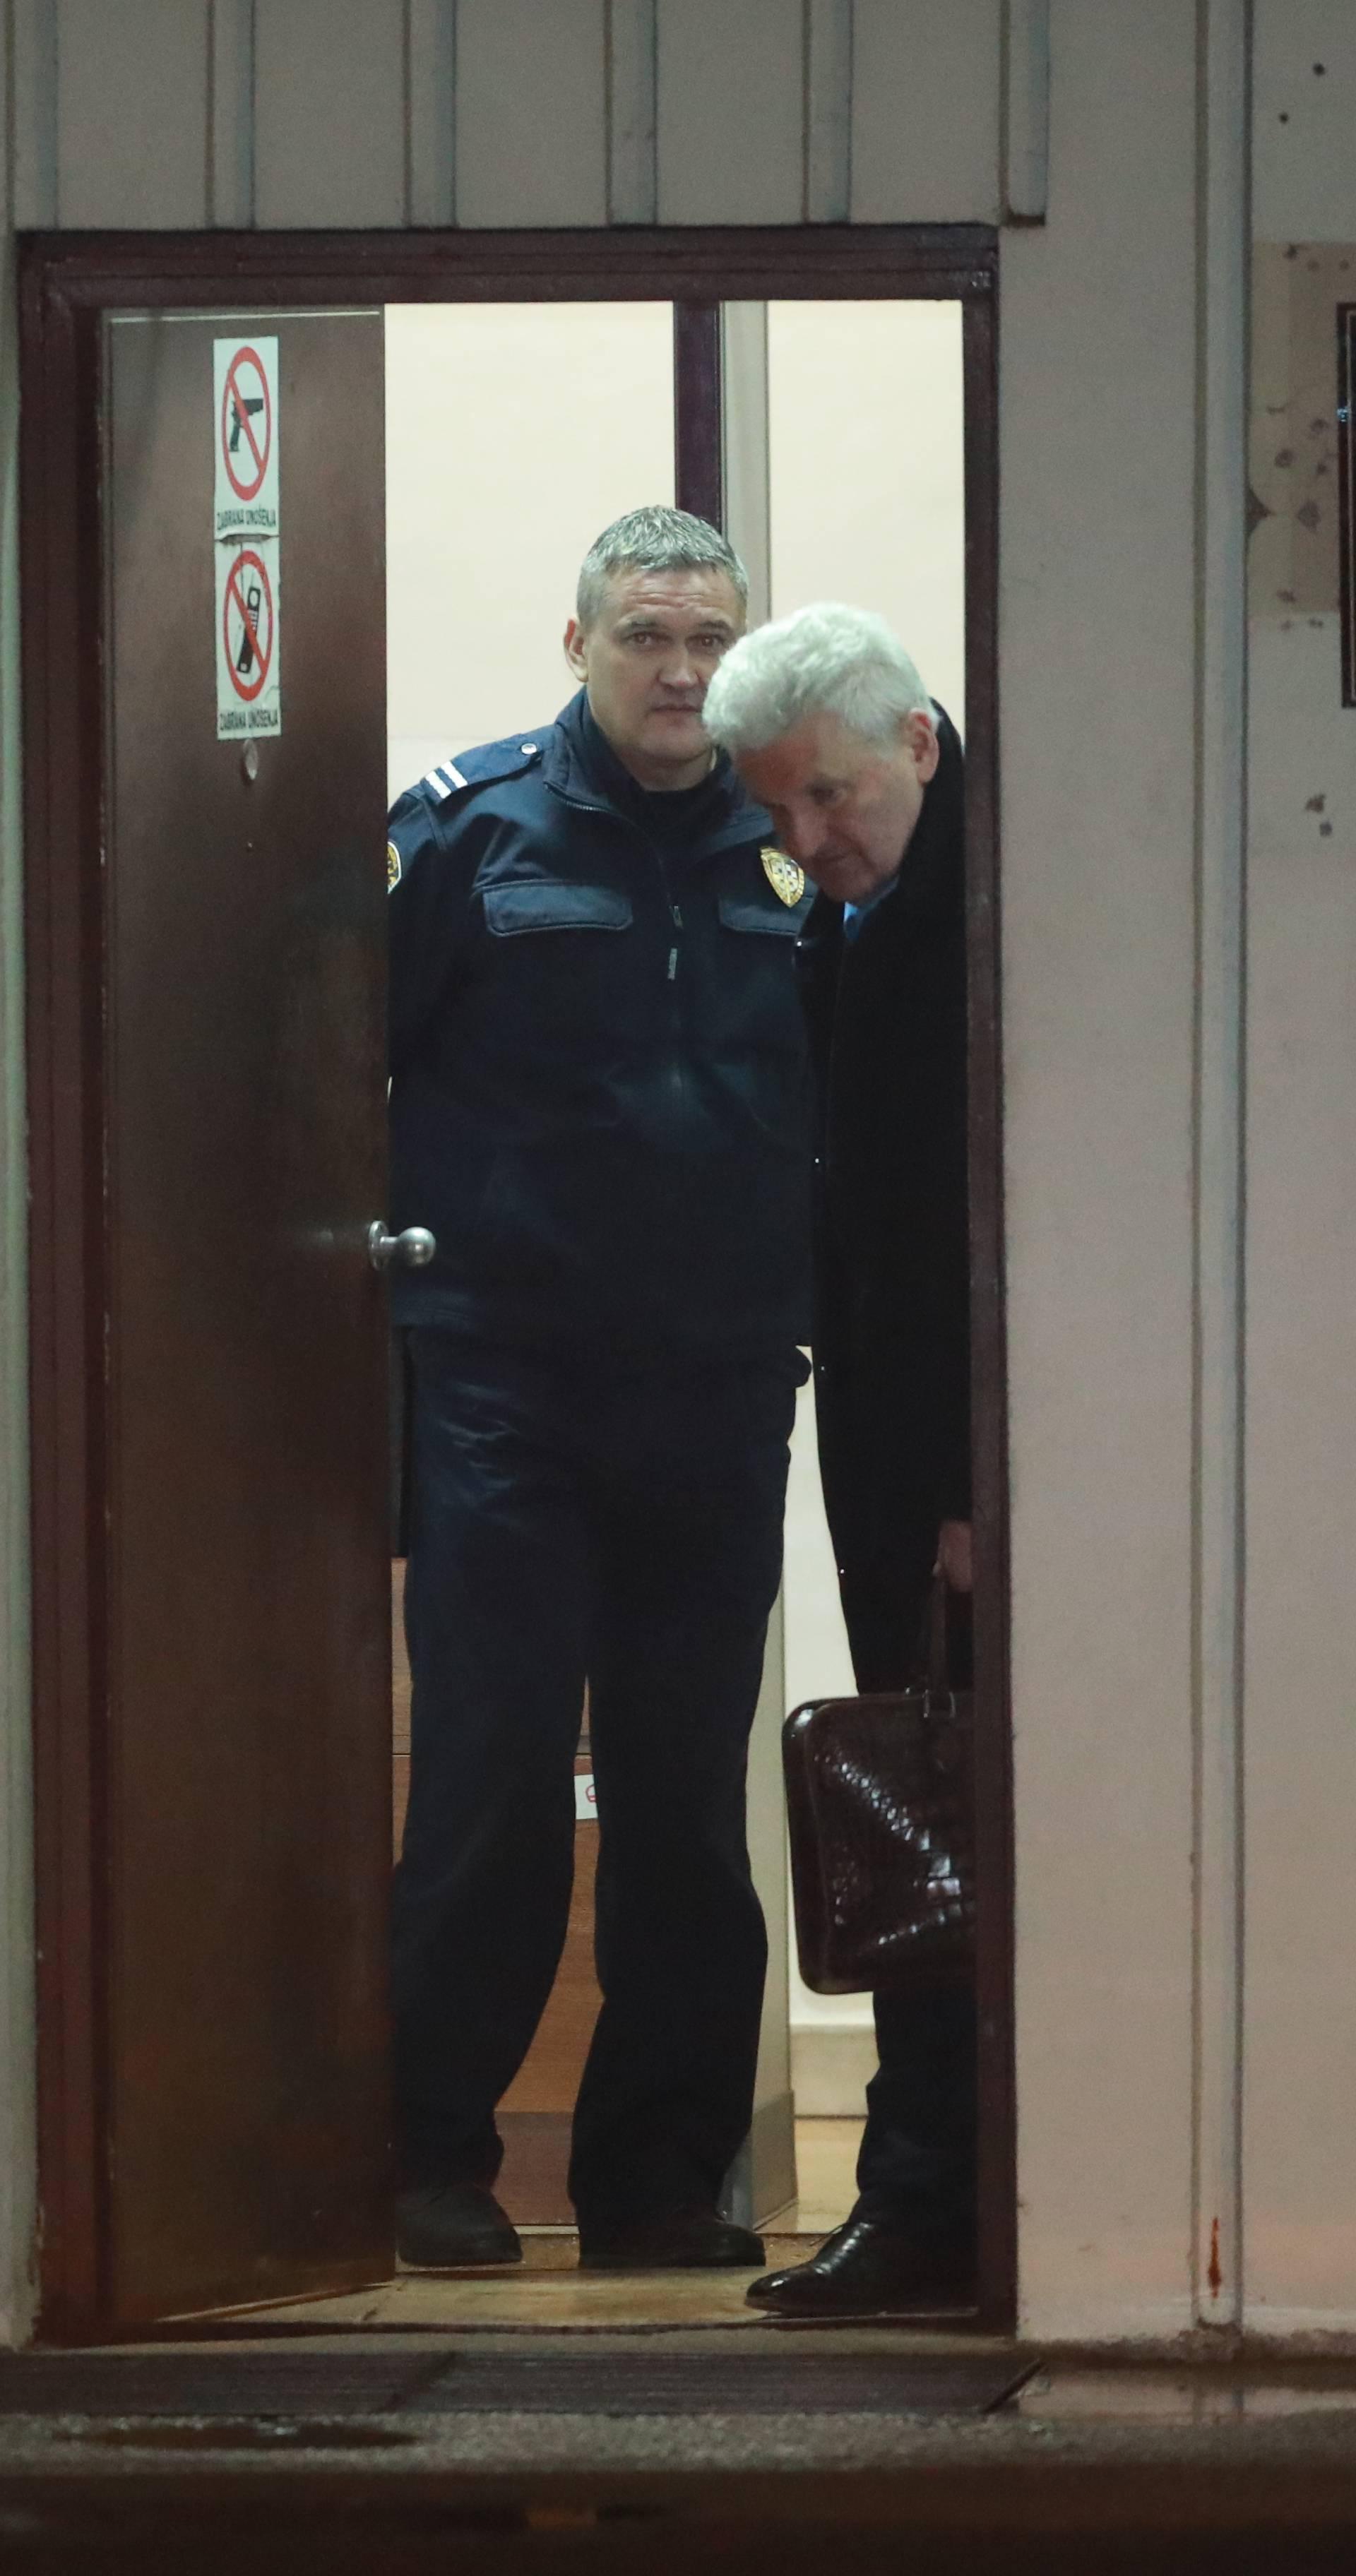 U pet dana Todorić sakupio milijun eura i izlazi iz Remetinca